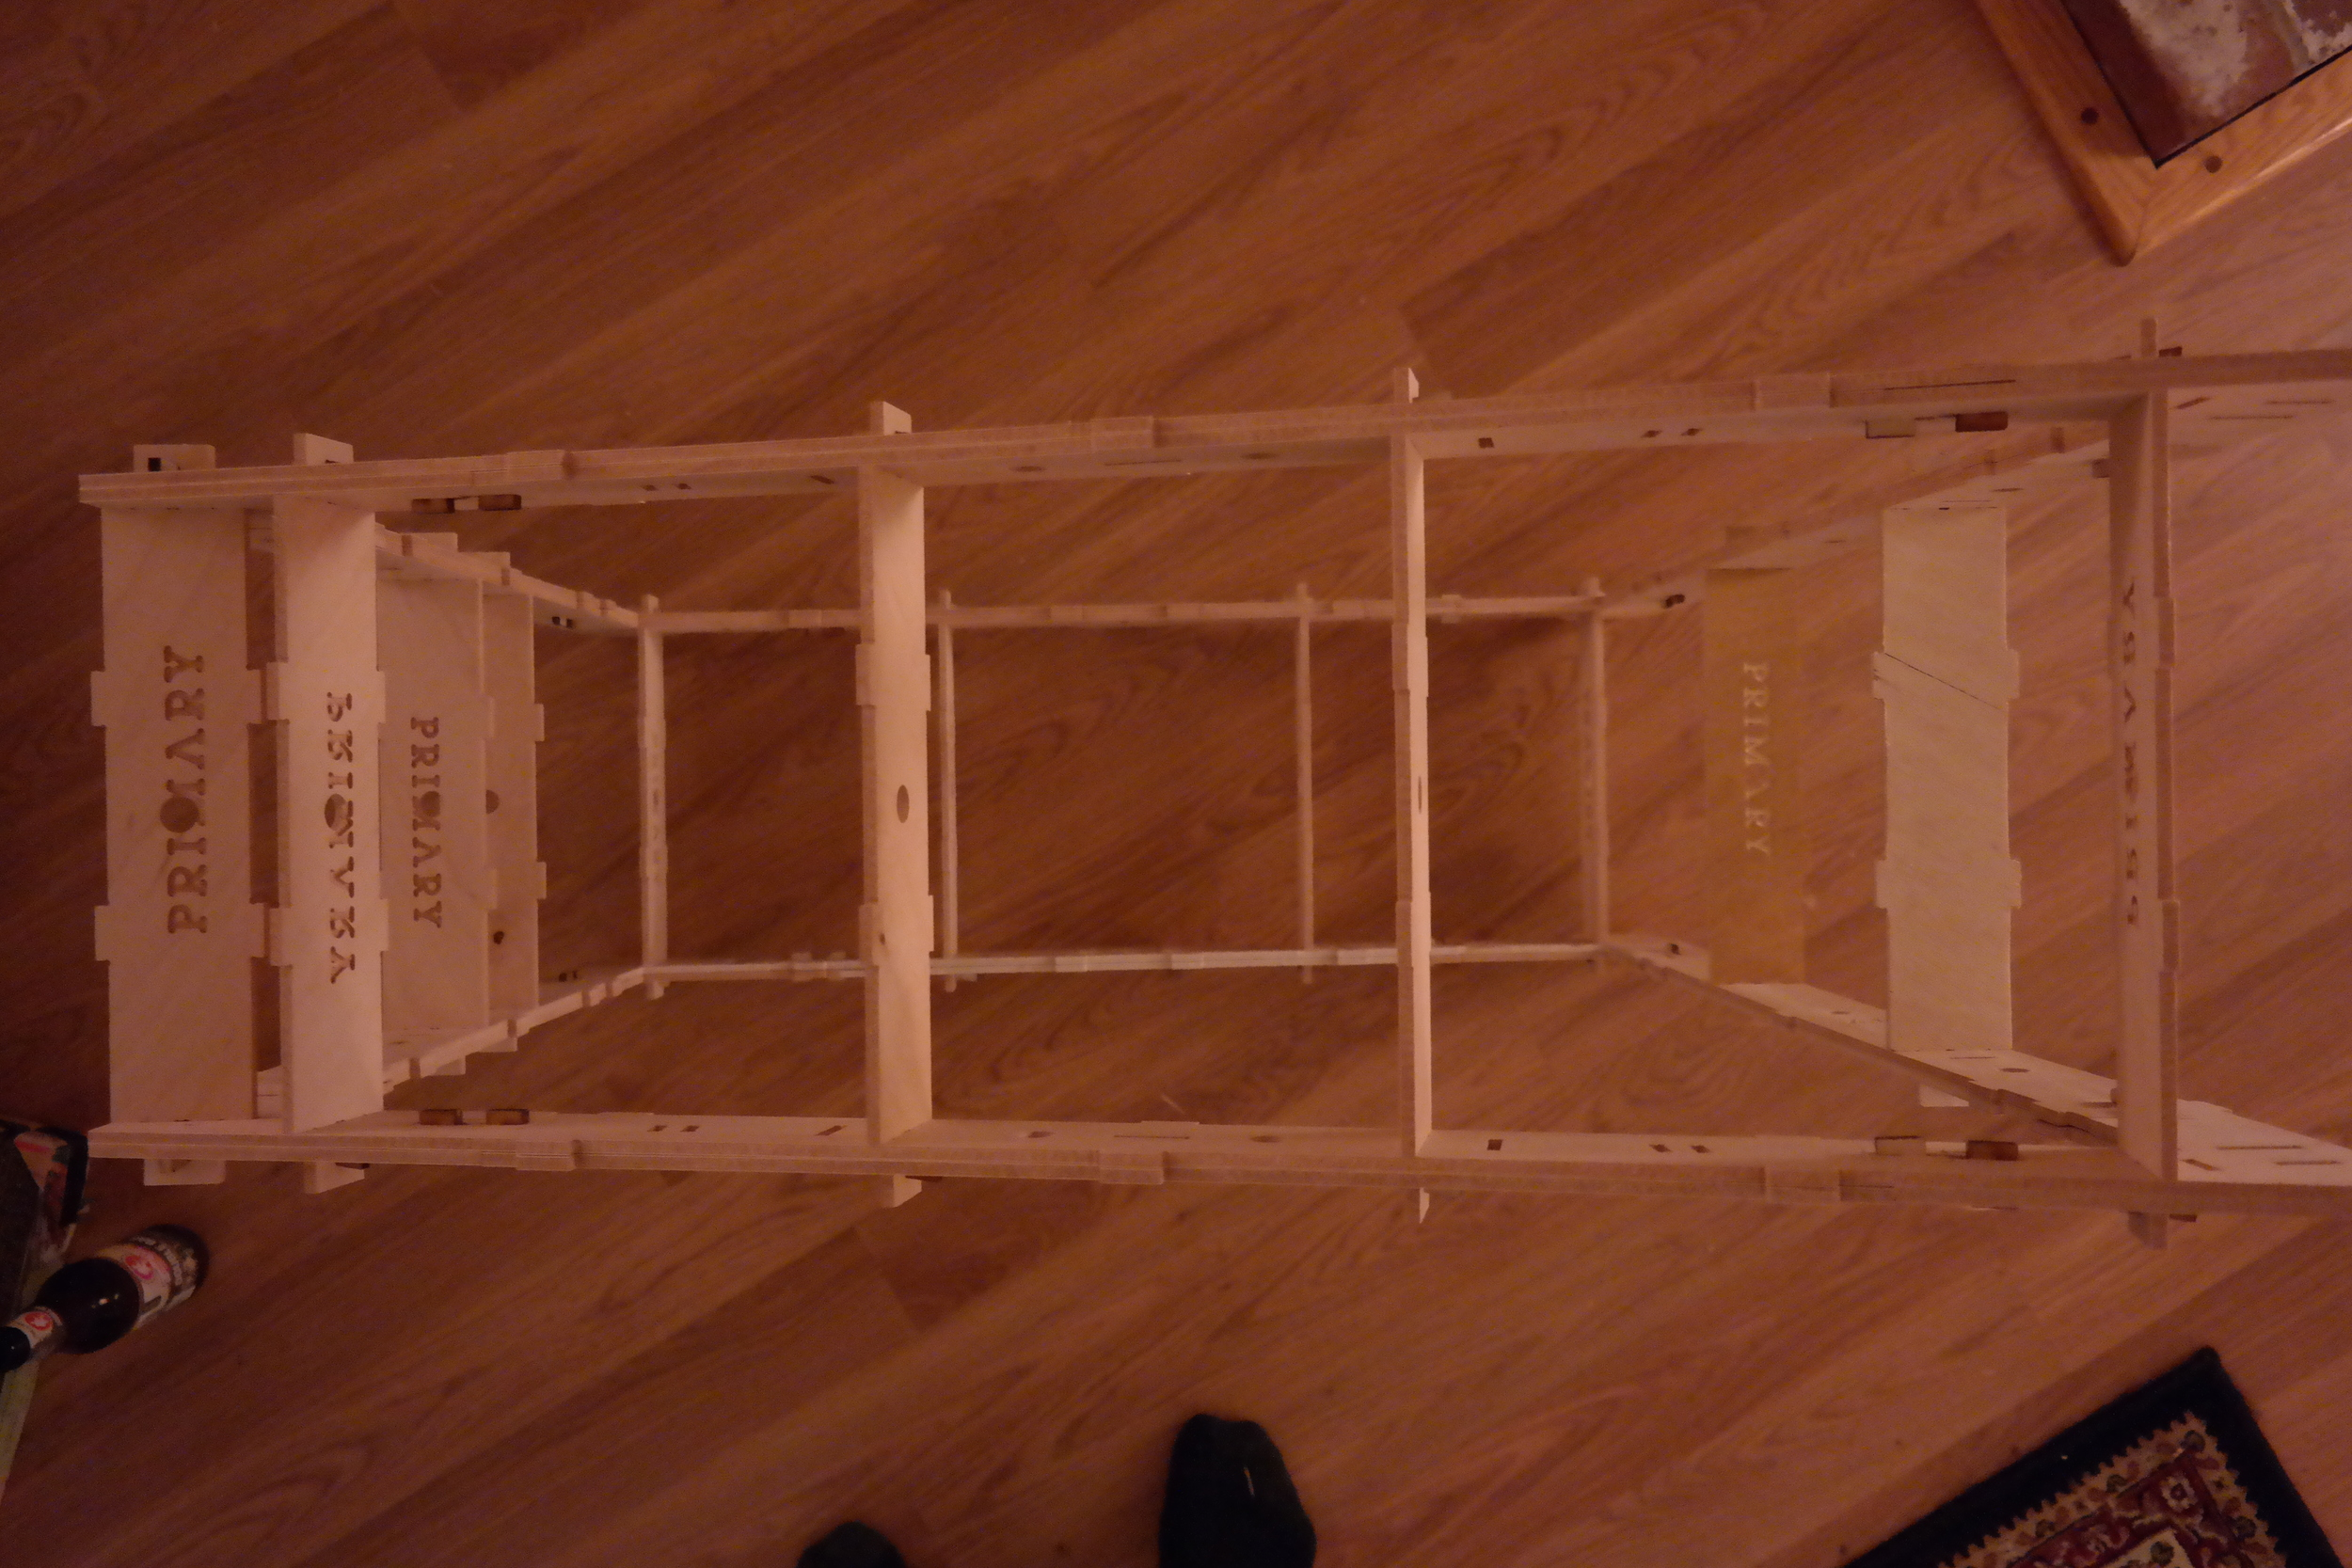 1st of 3 modules assembled